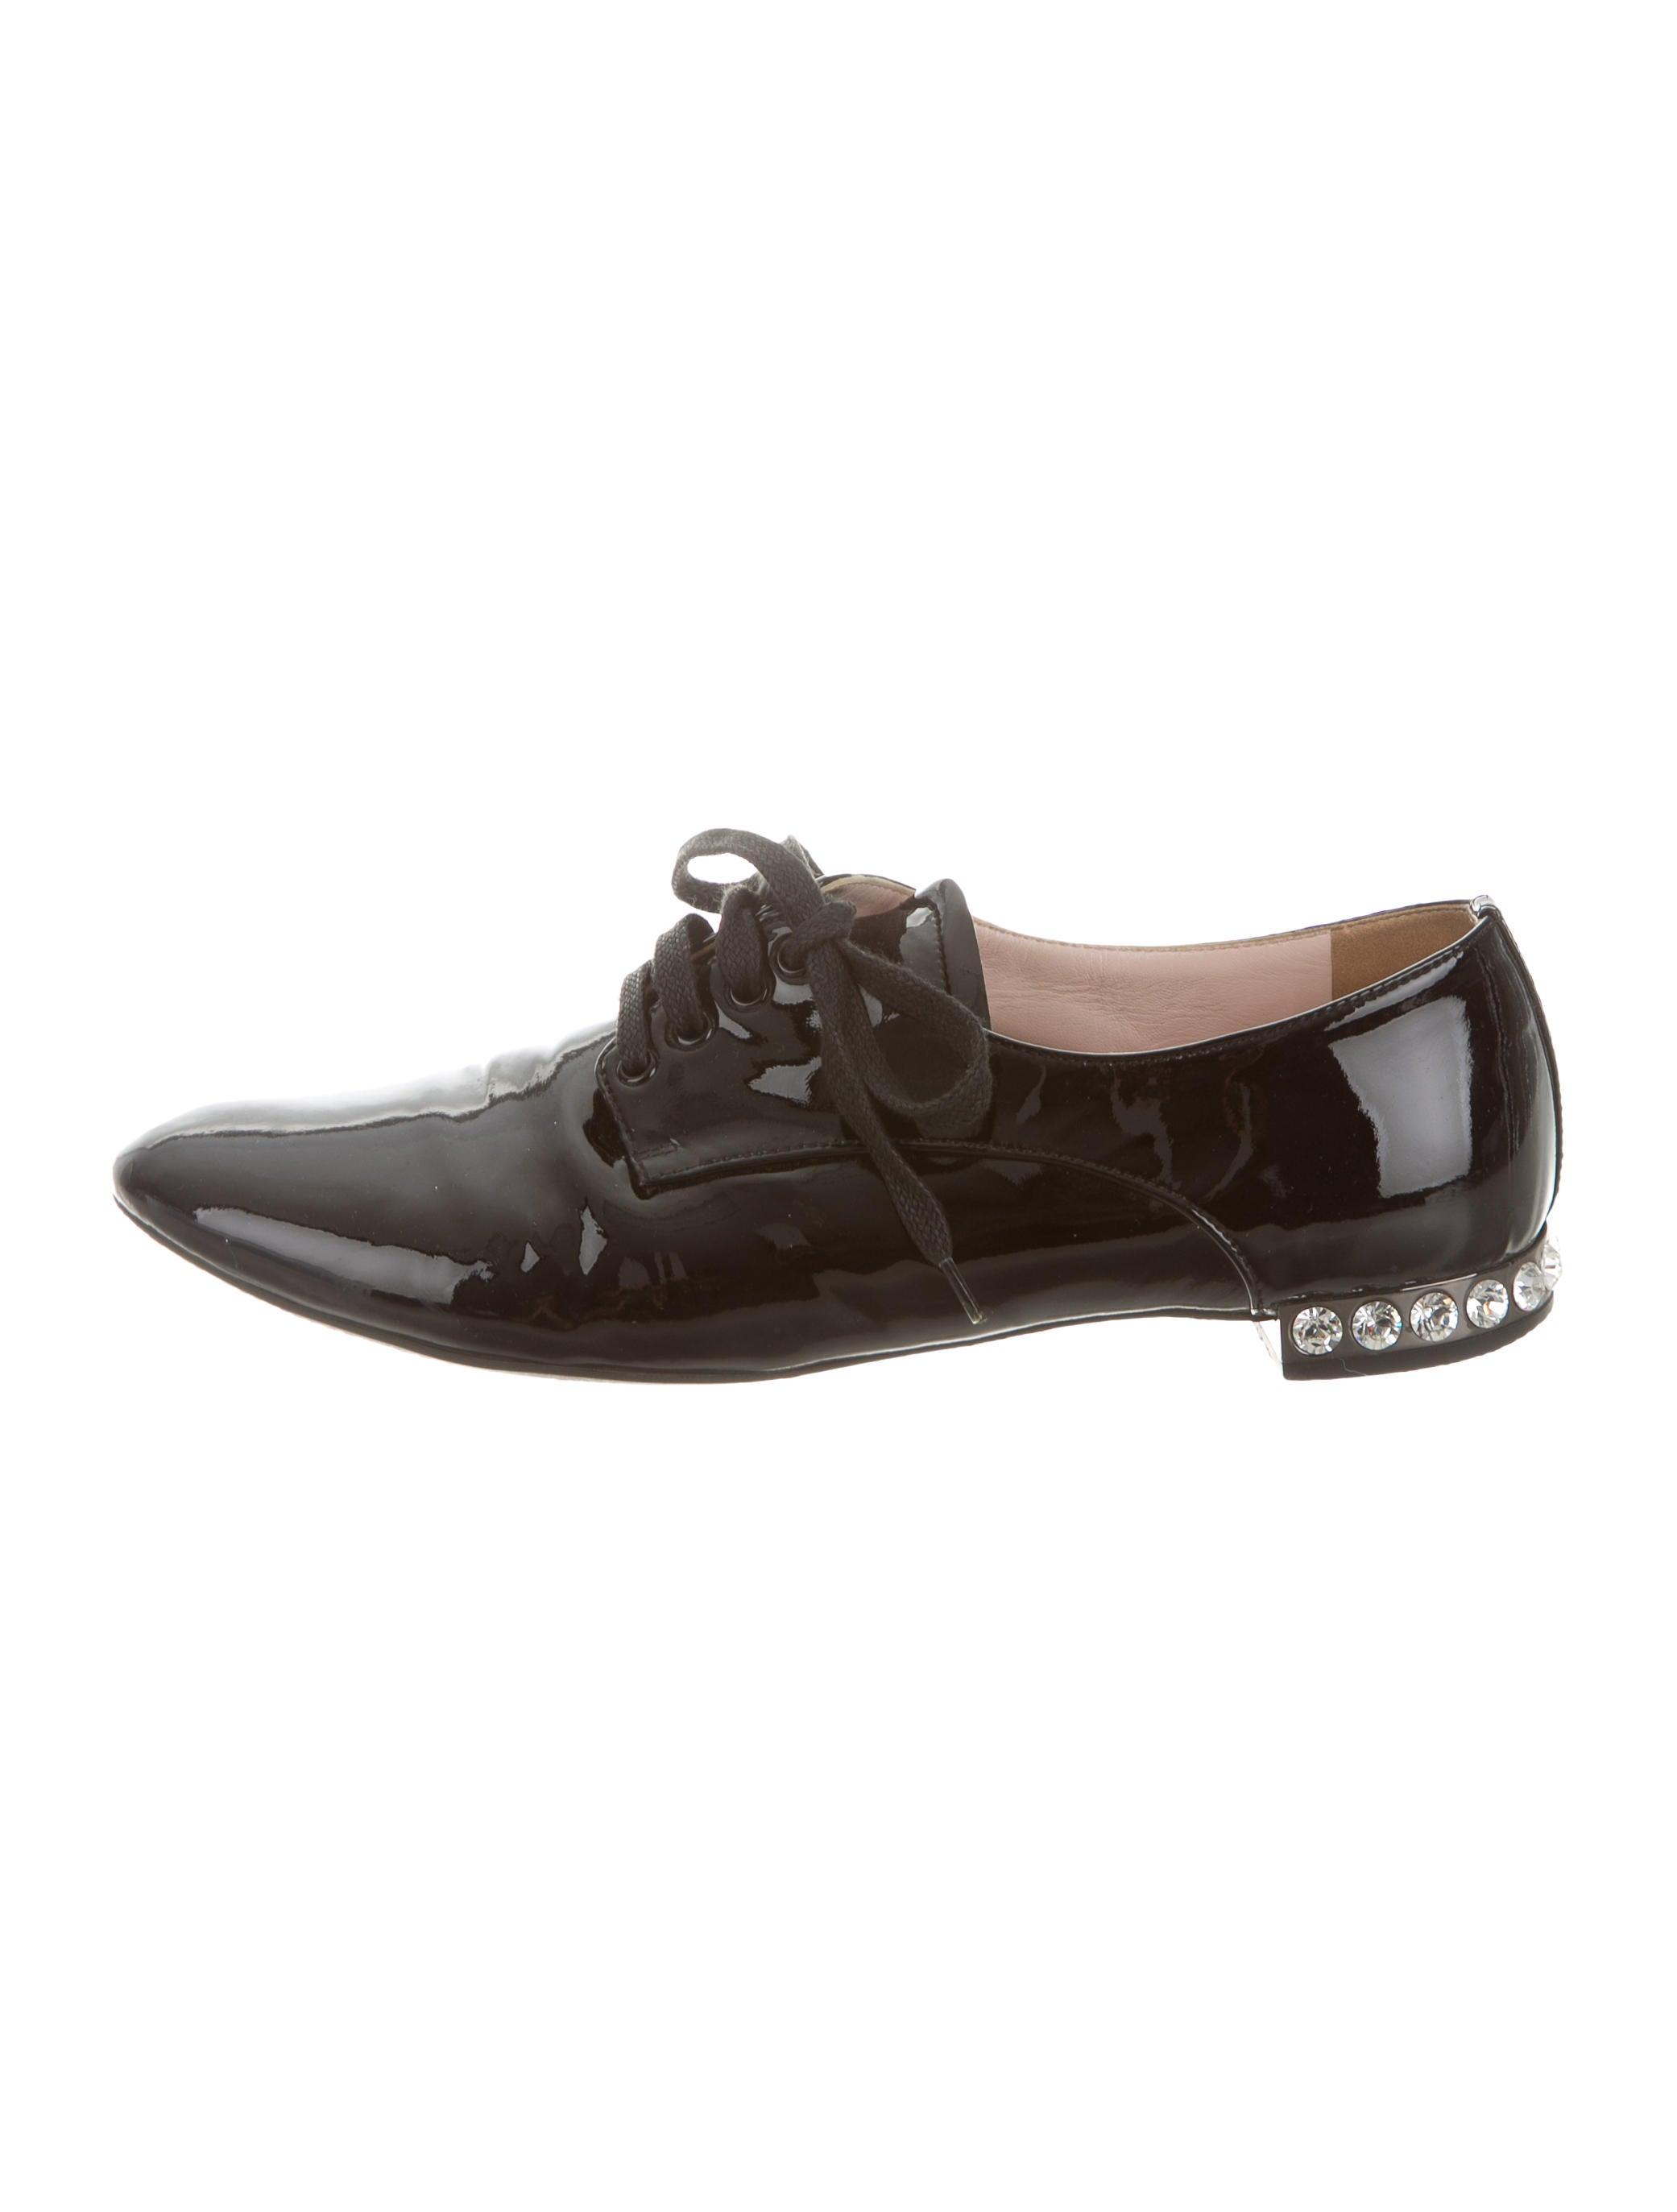 Miu Miu Patent Leather Oxfords - Shoes - MIU39539 | The RealReal